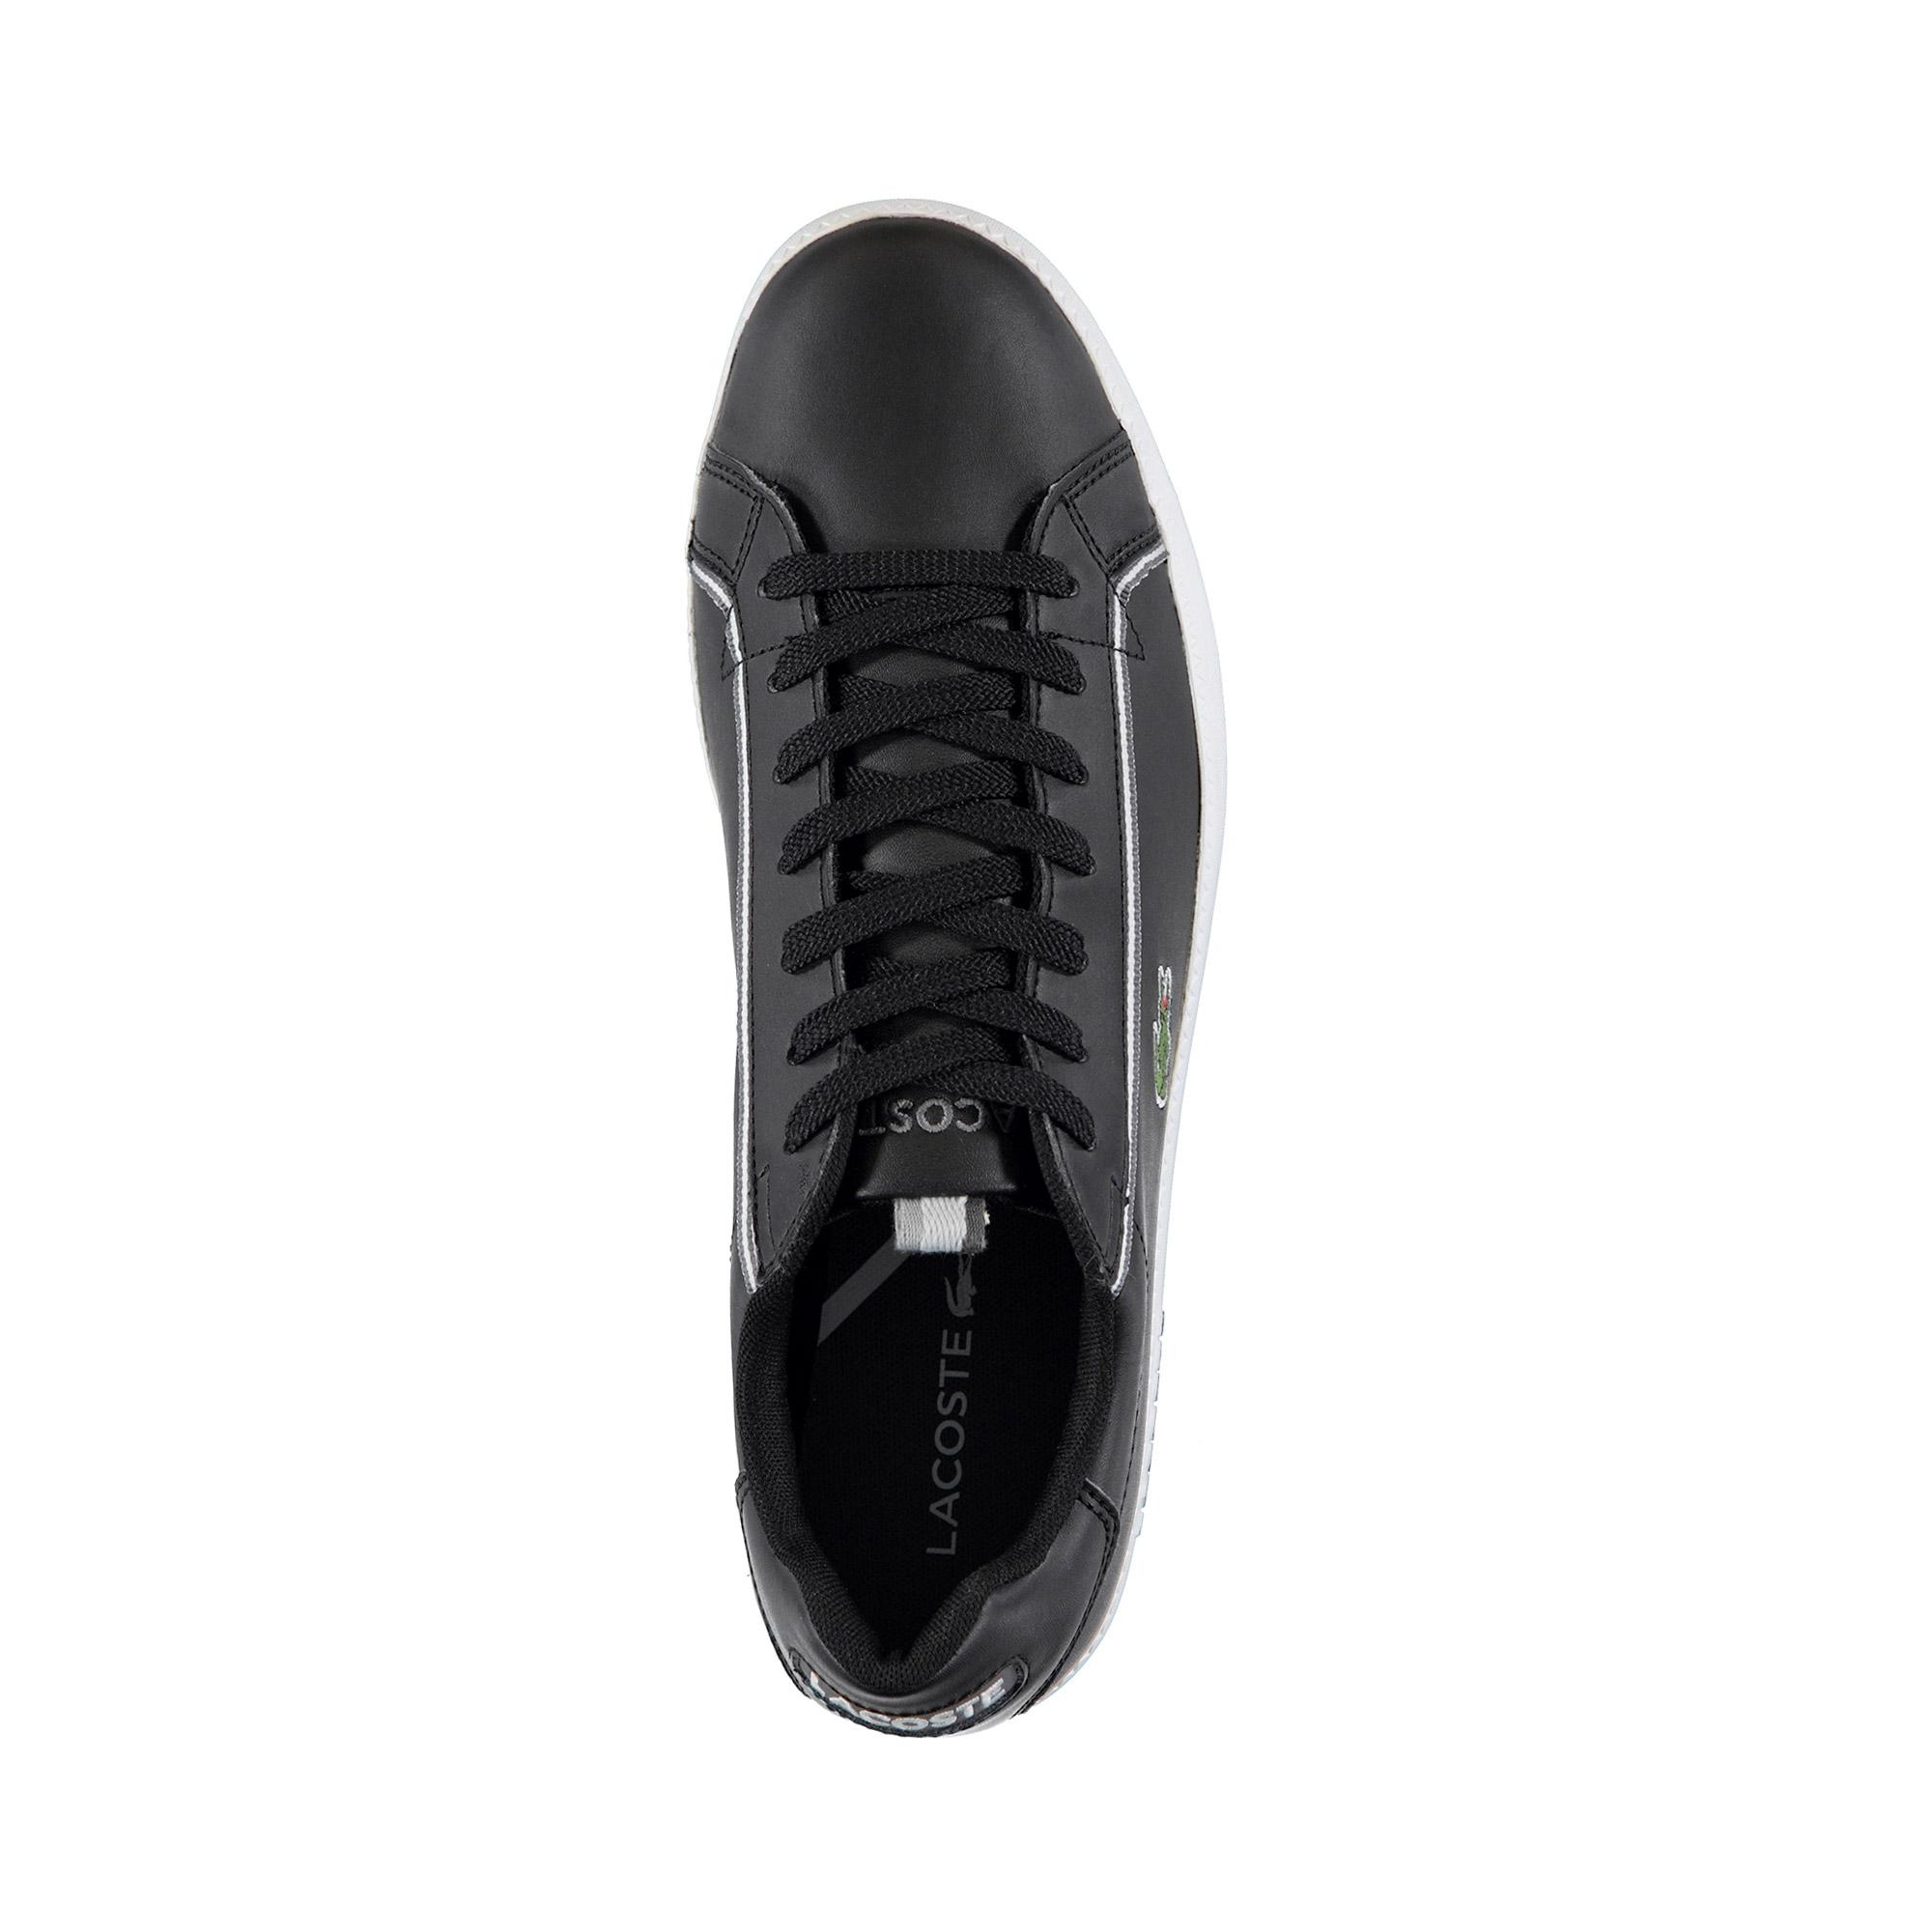 Lacoste Graduate 119 1 Men's Sneakers